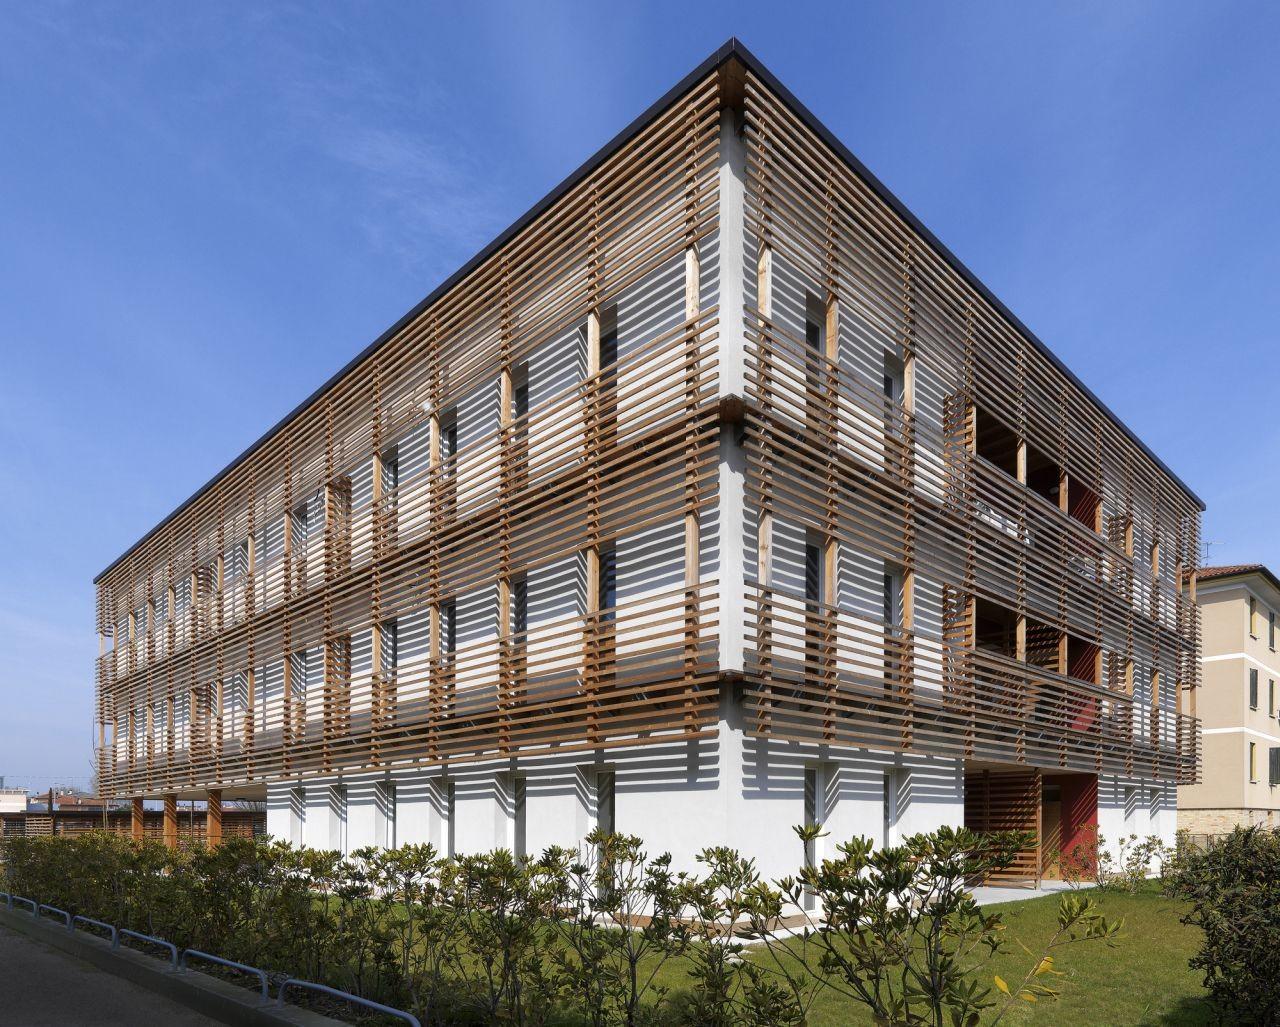 Social Houses in Motta di Livenza / Matteo Thun & Partners, © Daniele Domenicali